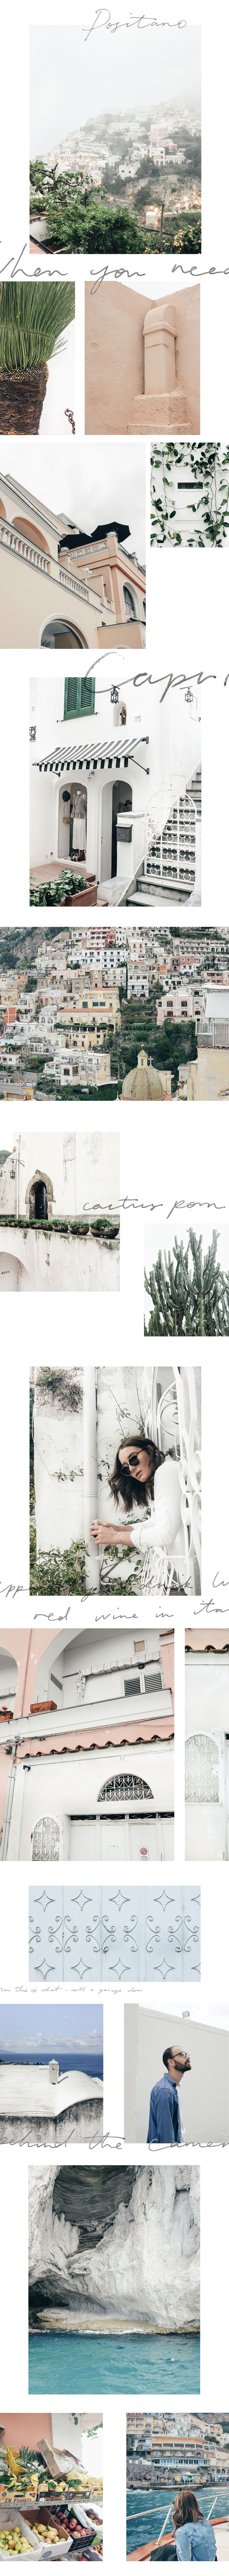 Positano Travel Guide | Italy Travel Tips